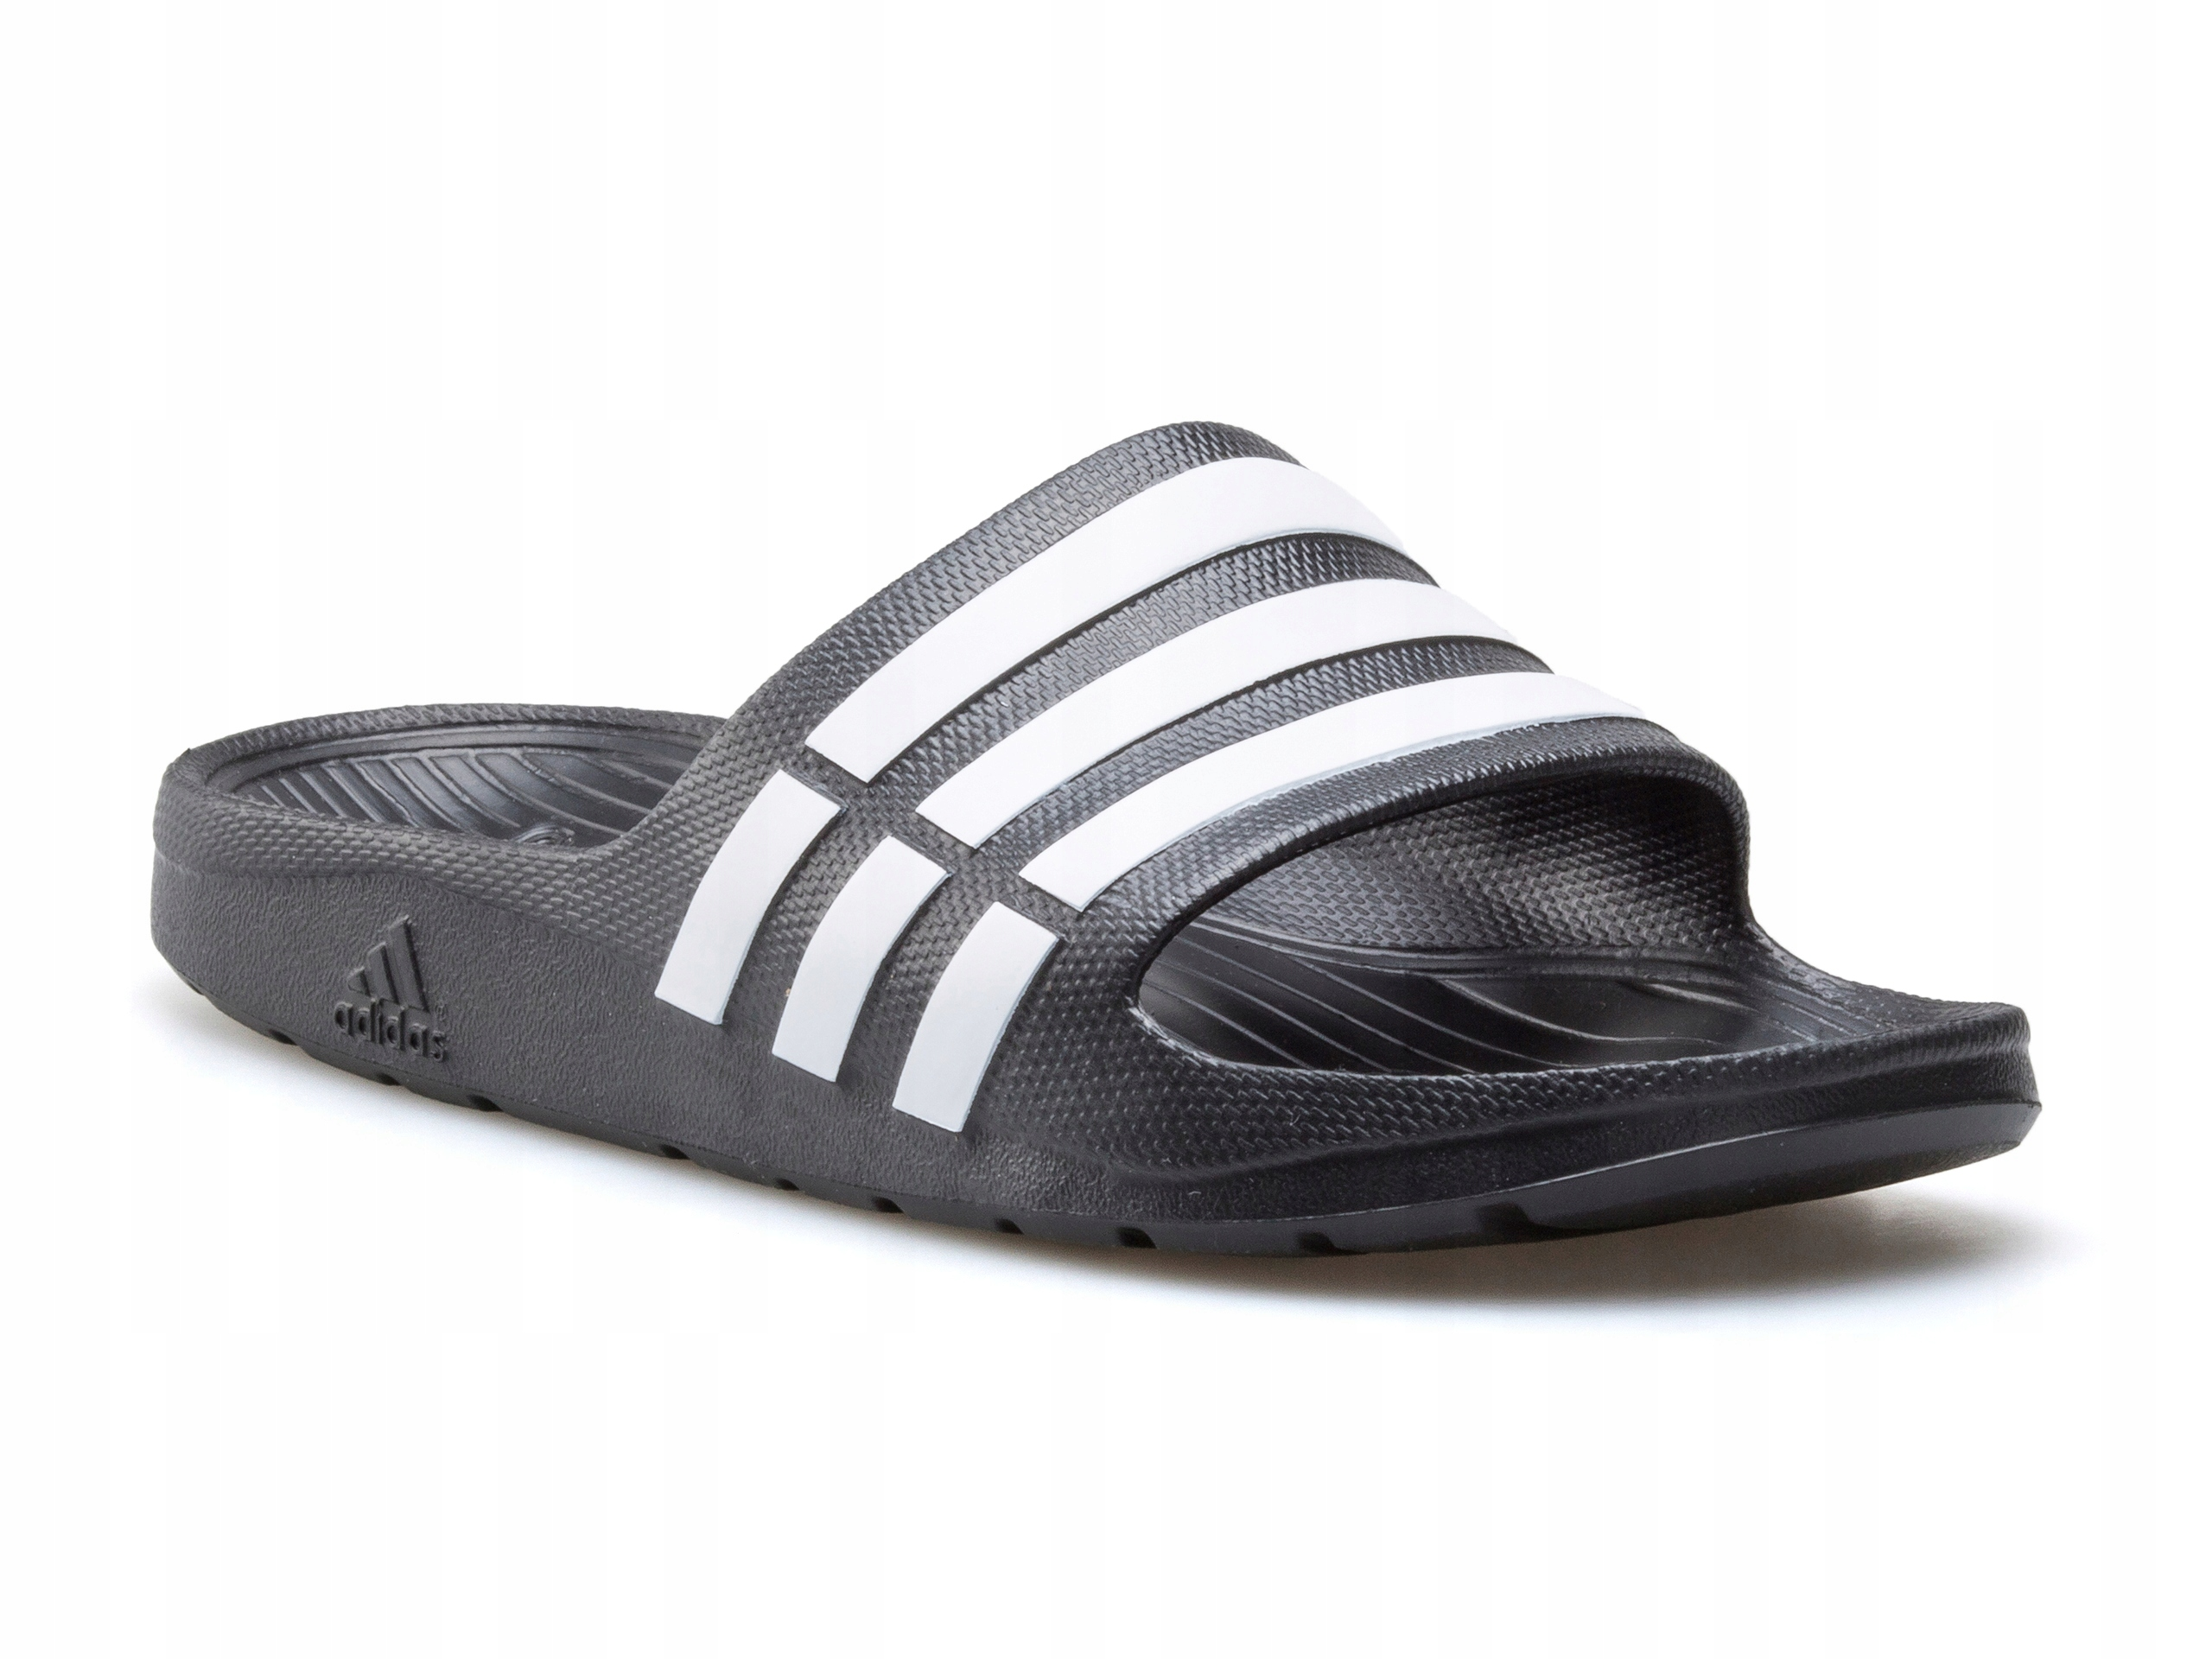 online retailer bbb31 af7b4 Klapki adidas Duramo Slide K G06799 r. 29